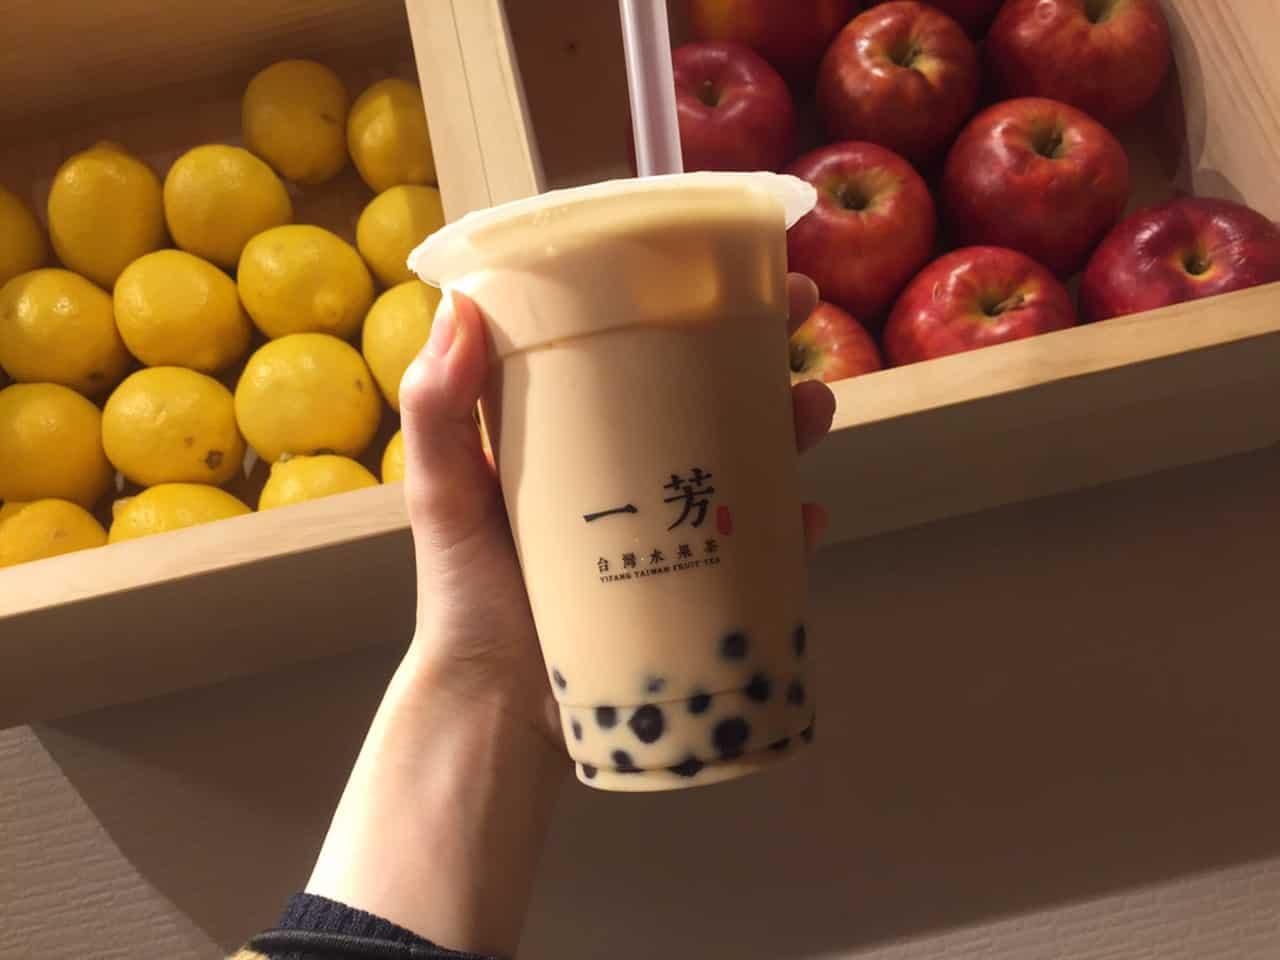 Yi Fang, Milk Tea, ชานมไข่มุก, Saisabo